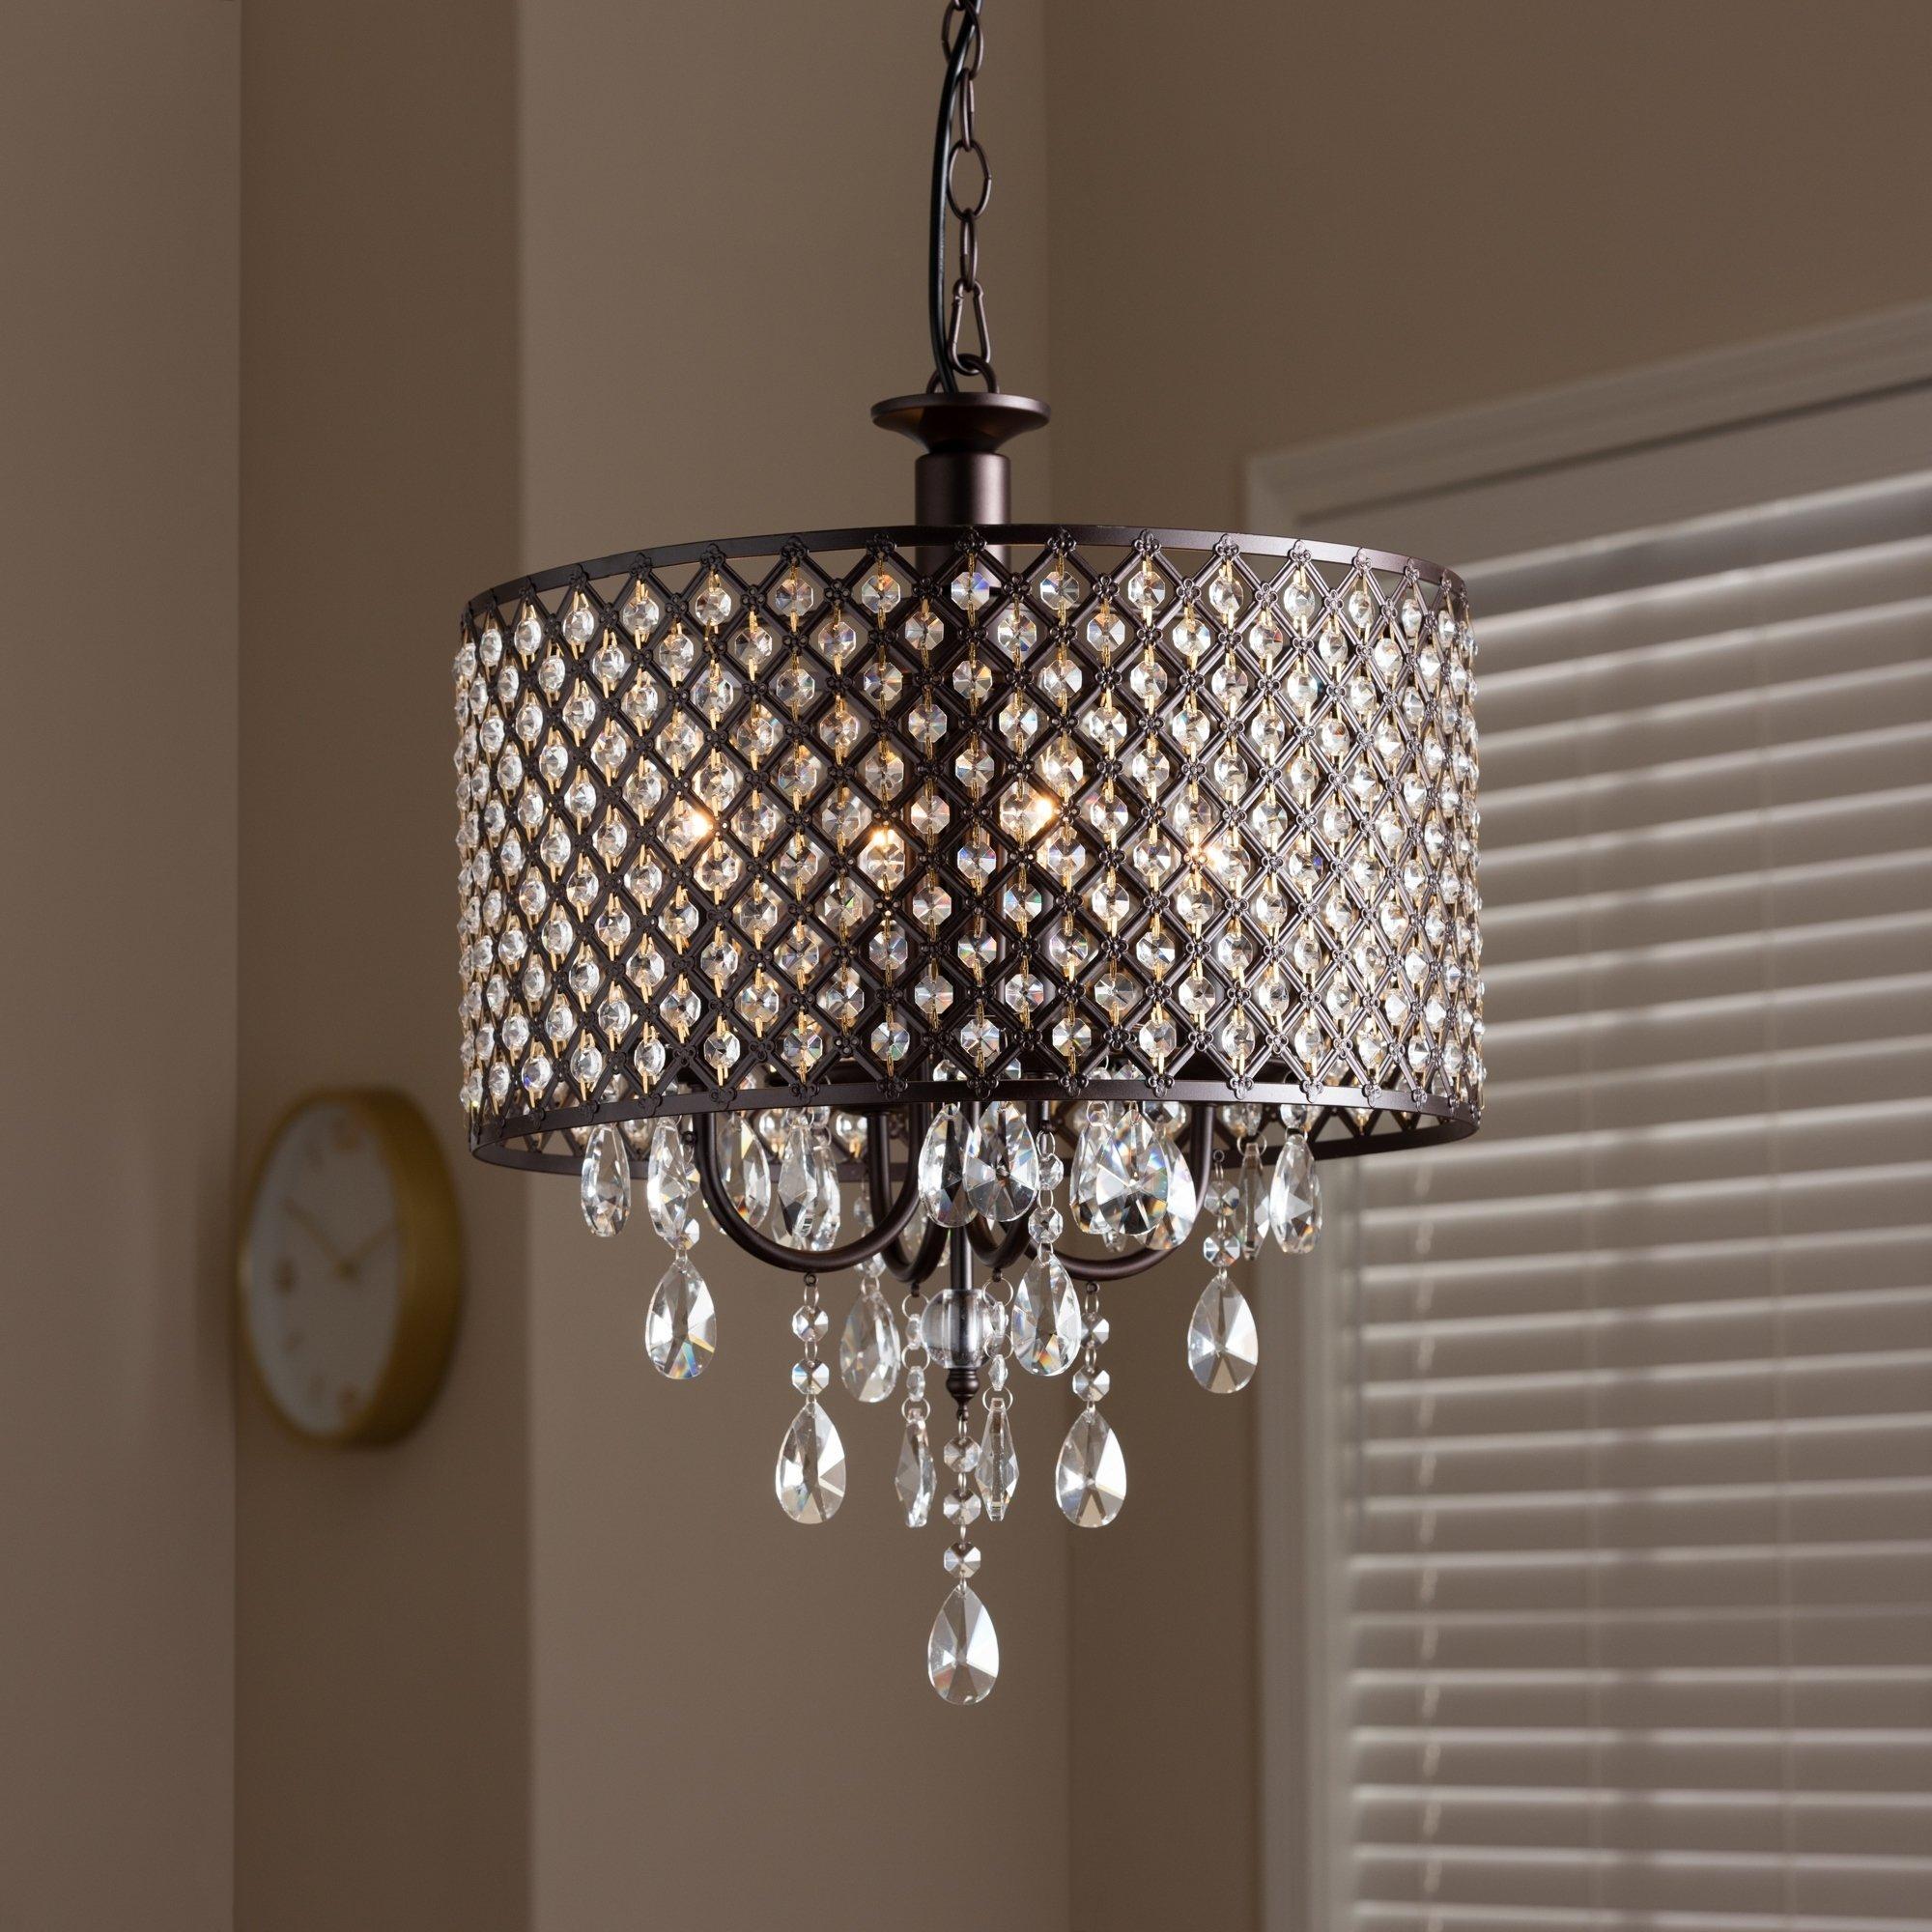 Contemporary Dark Bronze 4 Light Drum Pendant Light For Aldgate 4 Light Crystal Chandeliers (View 14 of 30)